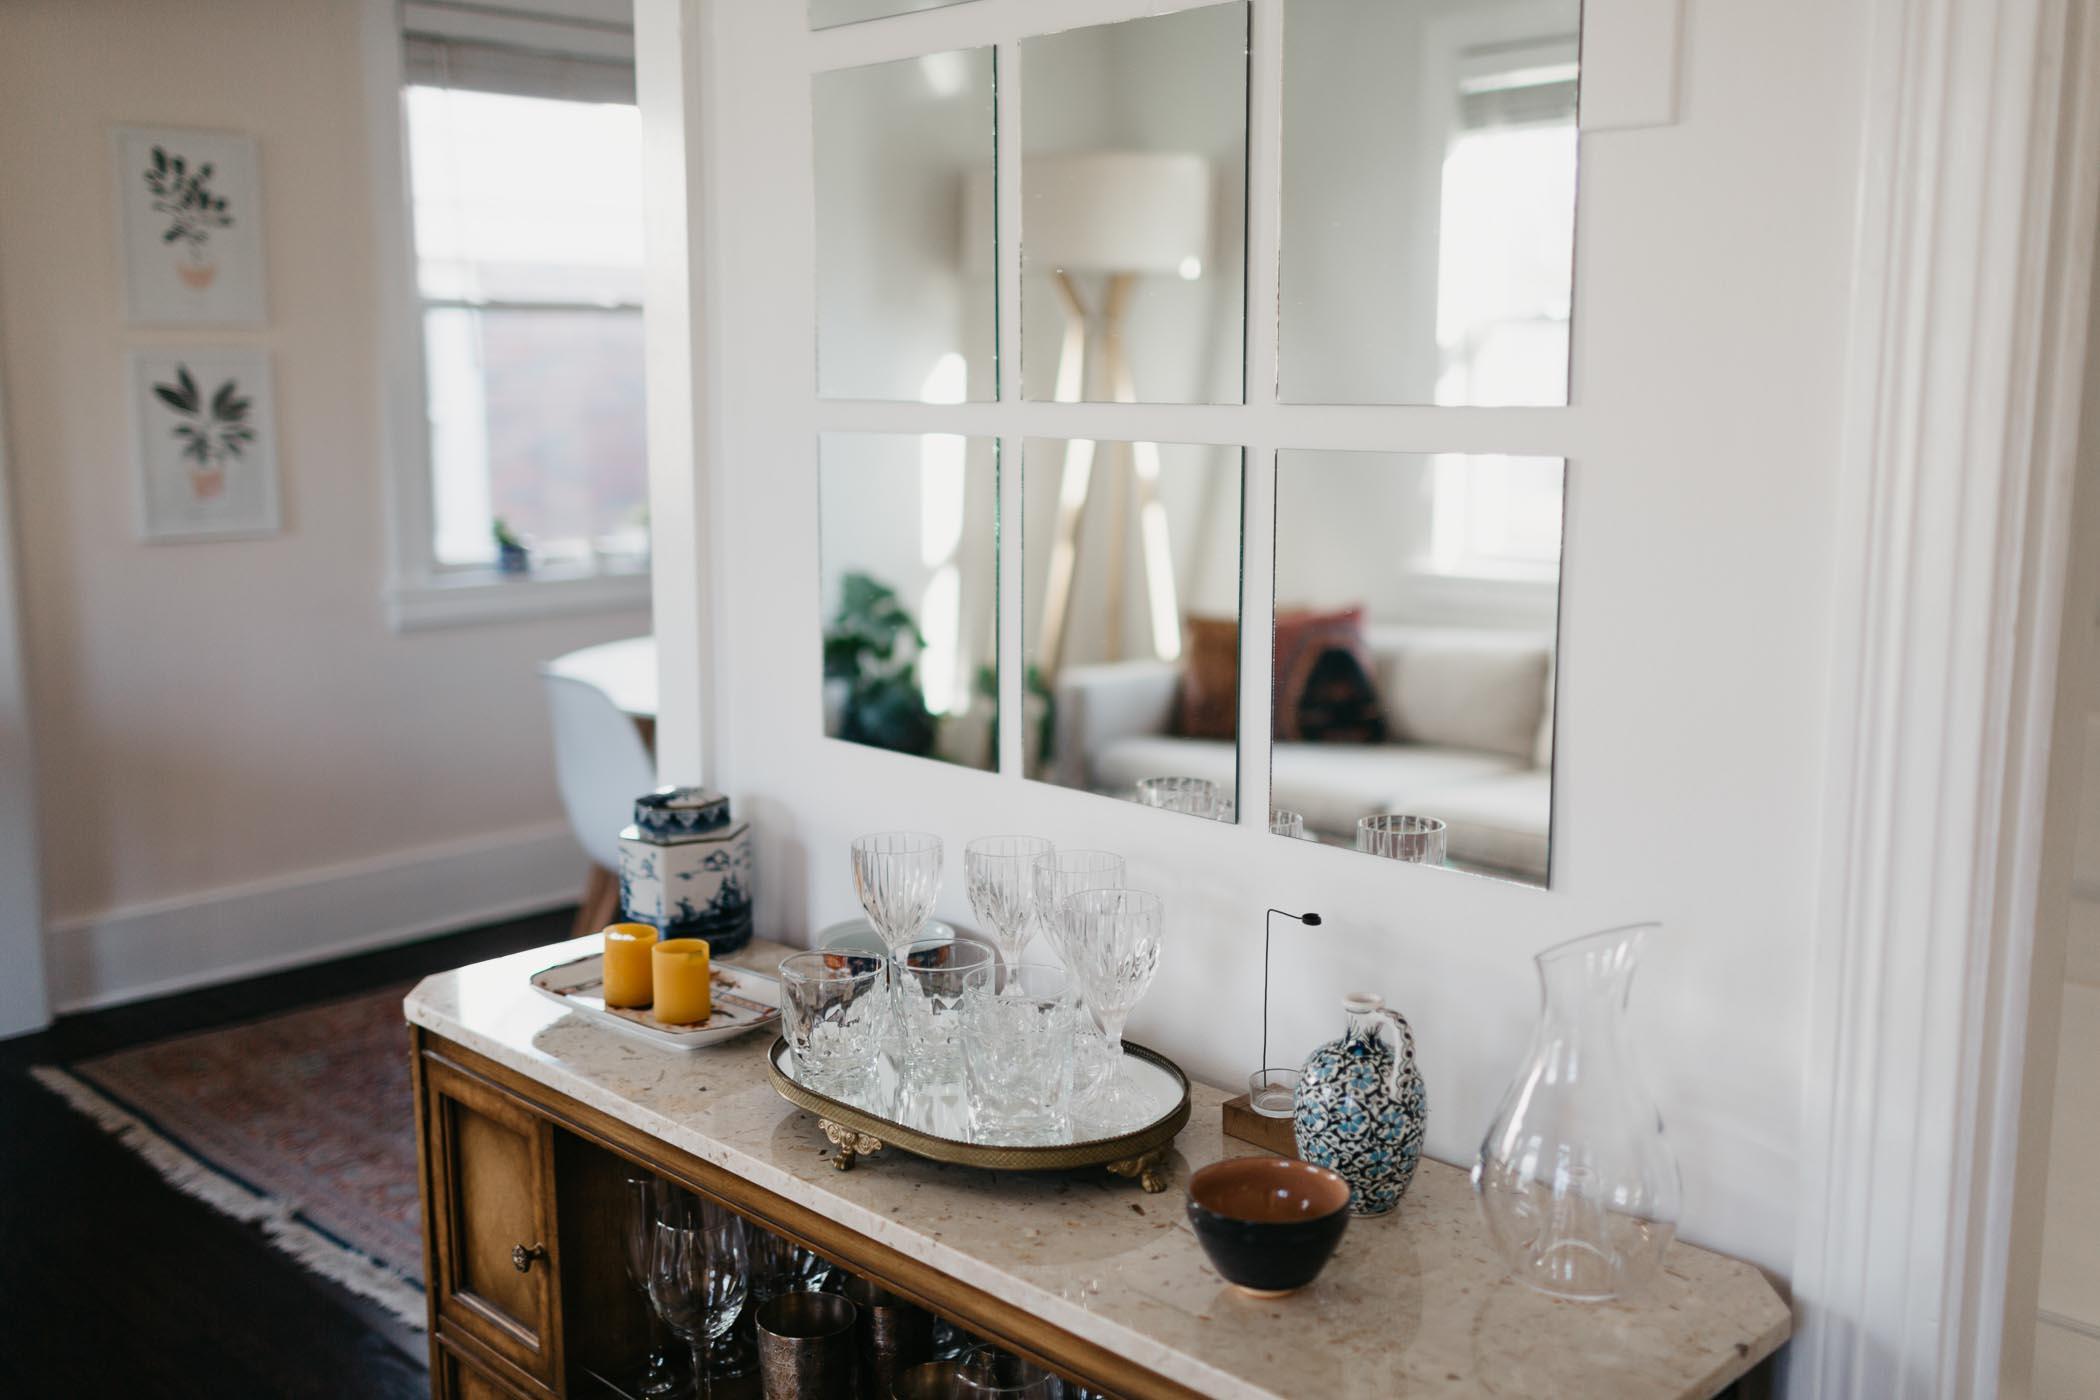 cozy-casa-nashville-tn-natural-light-studio-photography-ideas-lifestyle-photographer-photography-40.jpg